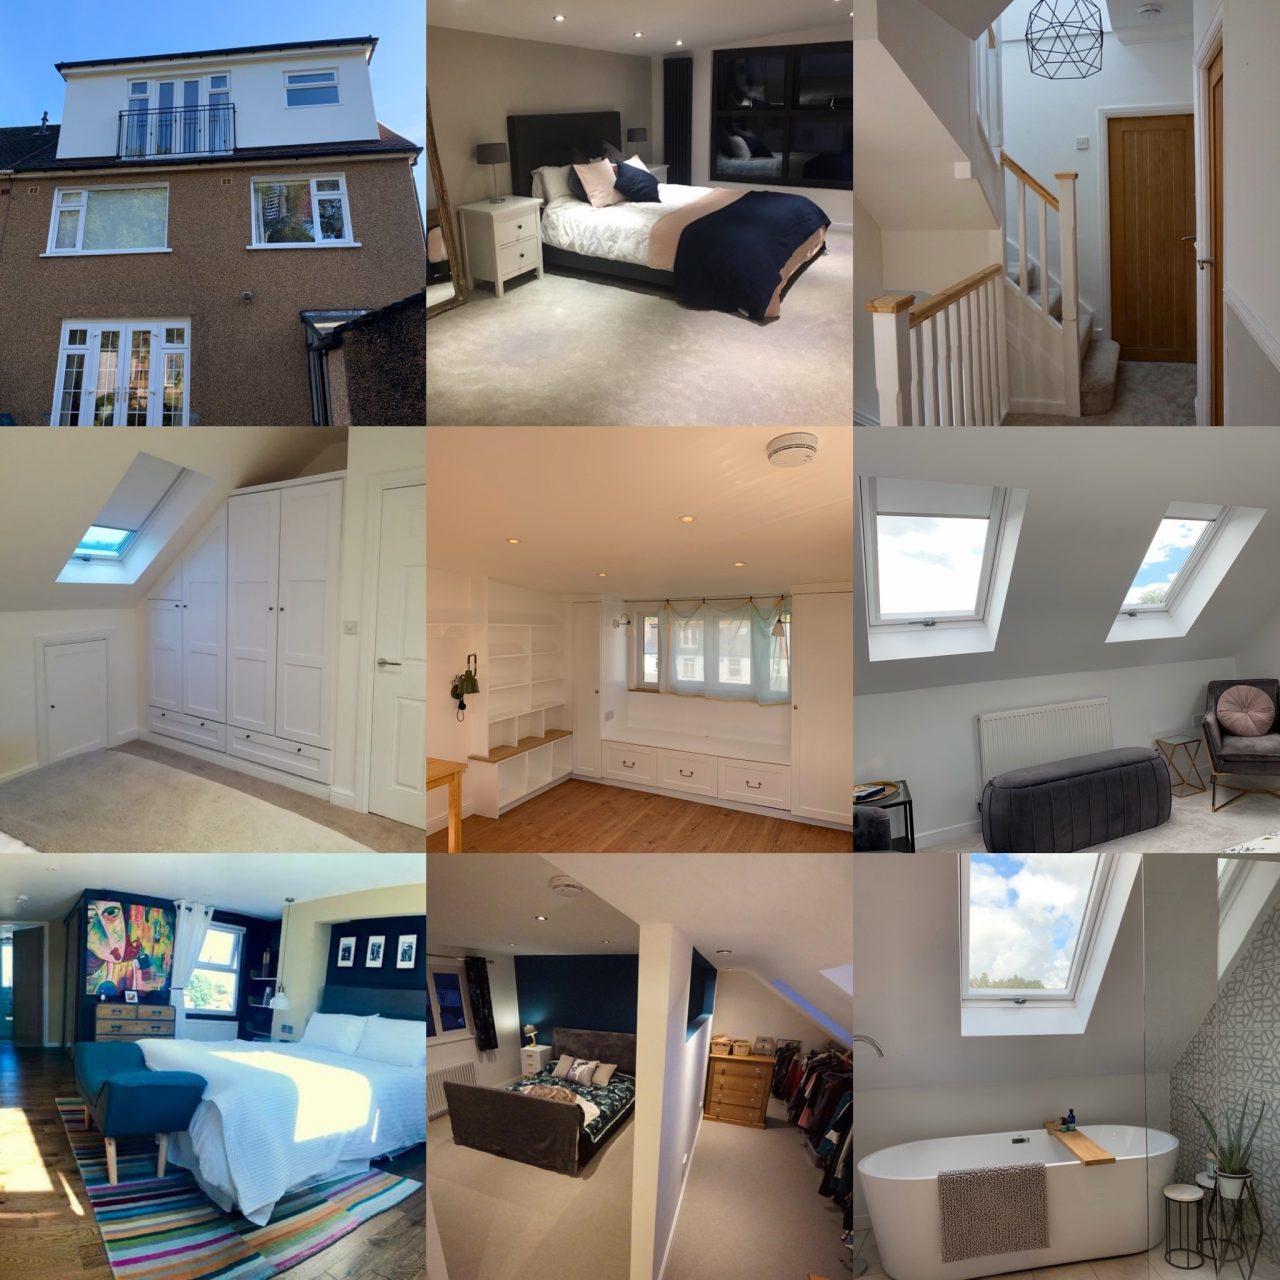 sky-blue-lofts-south-wales-loft-conversion-company-cardiff-attic-dormers-carpentry-services-home-gym-aberdare-rhondda-merthyr